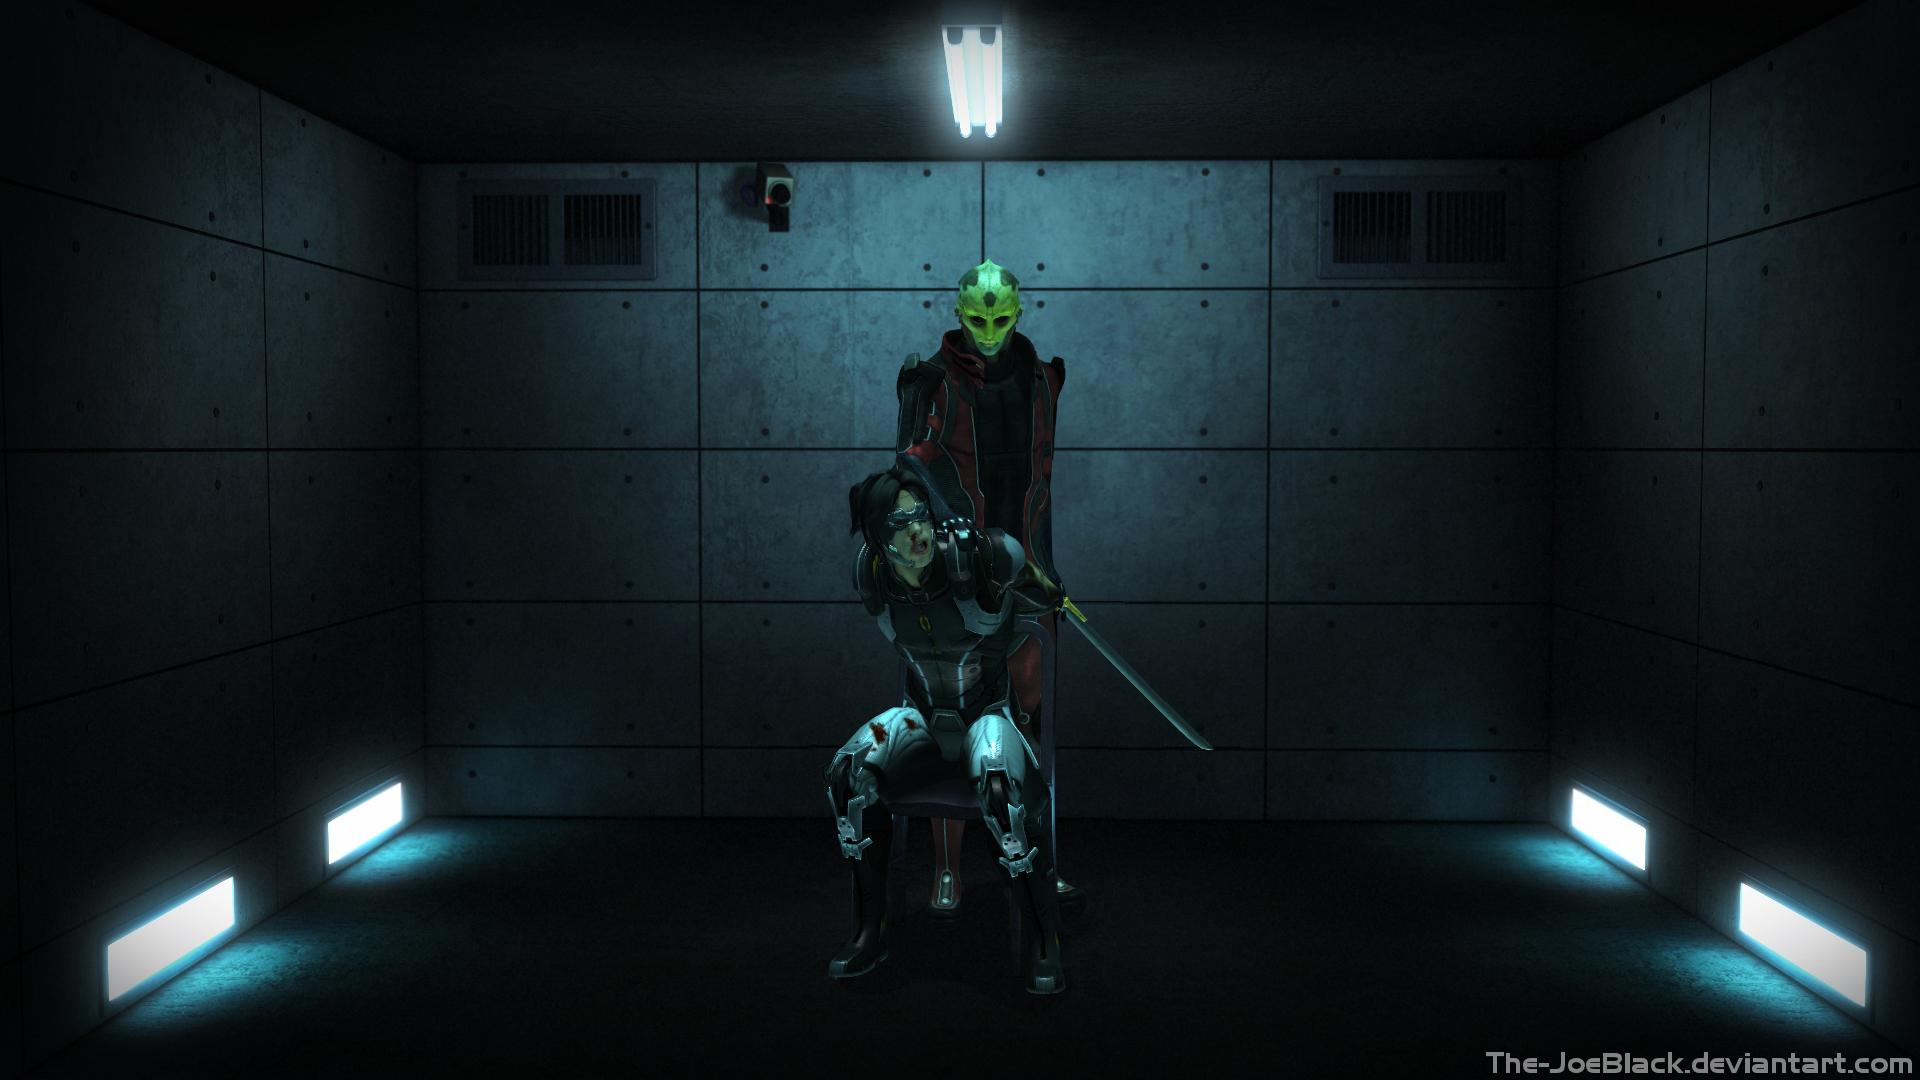 Mass Effect - Interrogation Room by The-JoeBlack